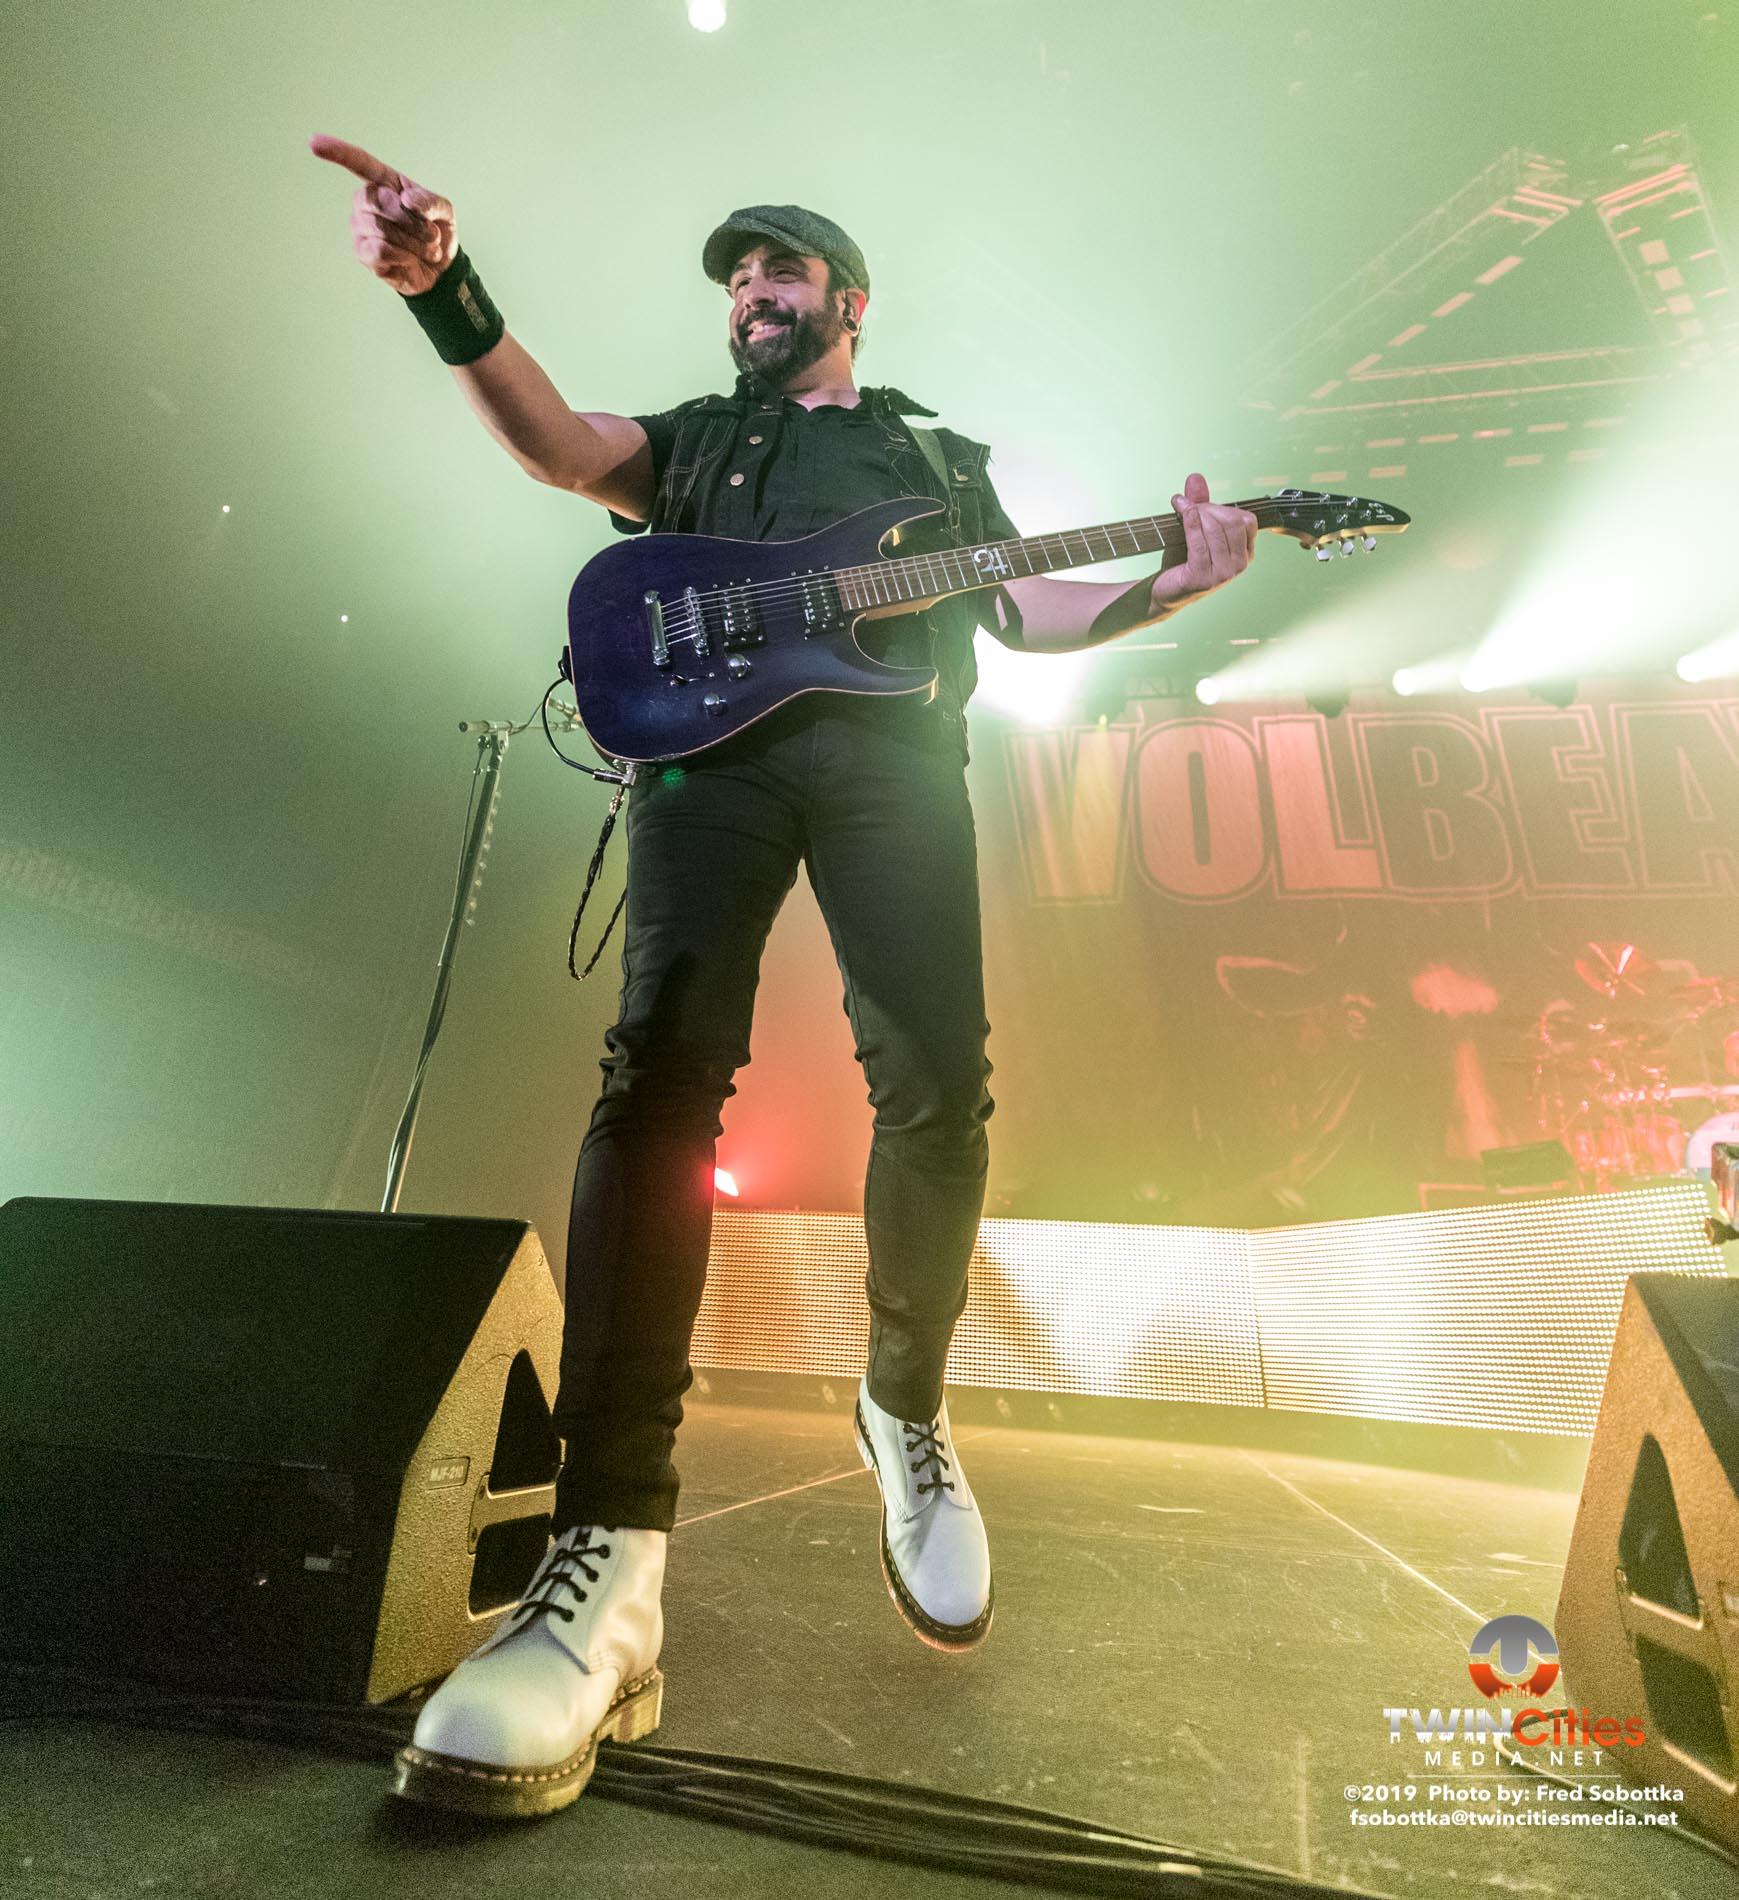 Volbeat-18